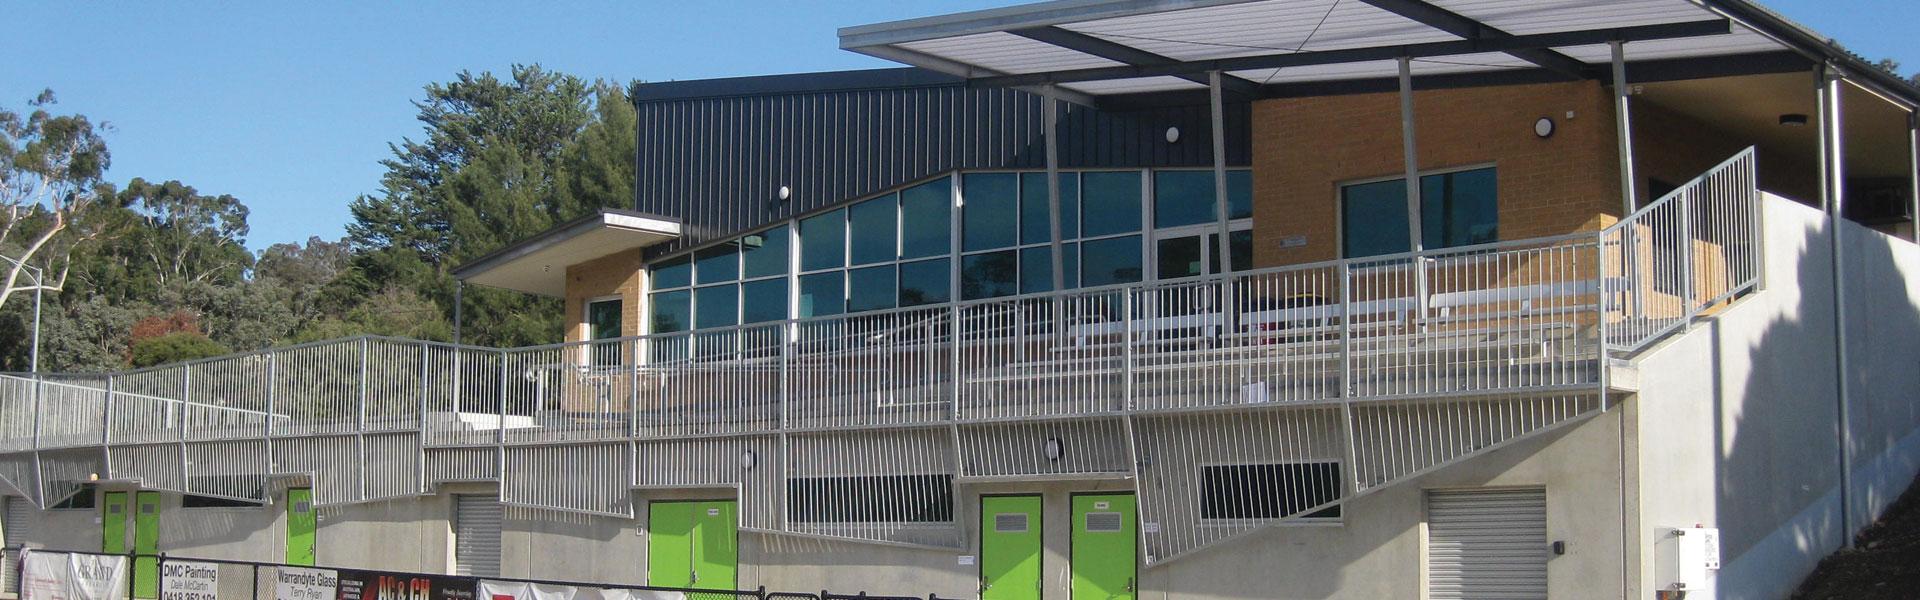 exterior of sports pavillion